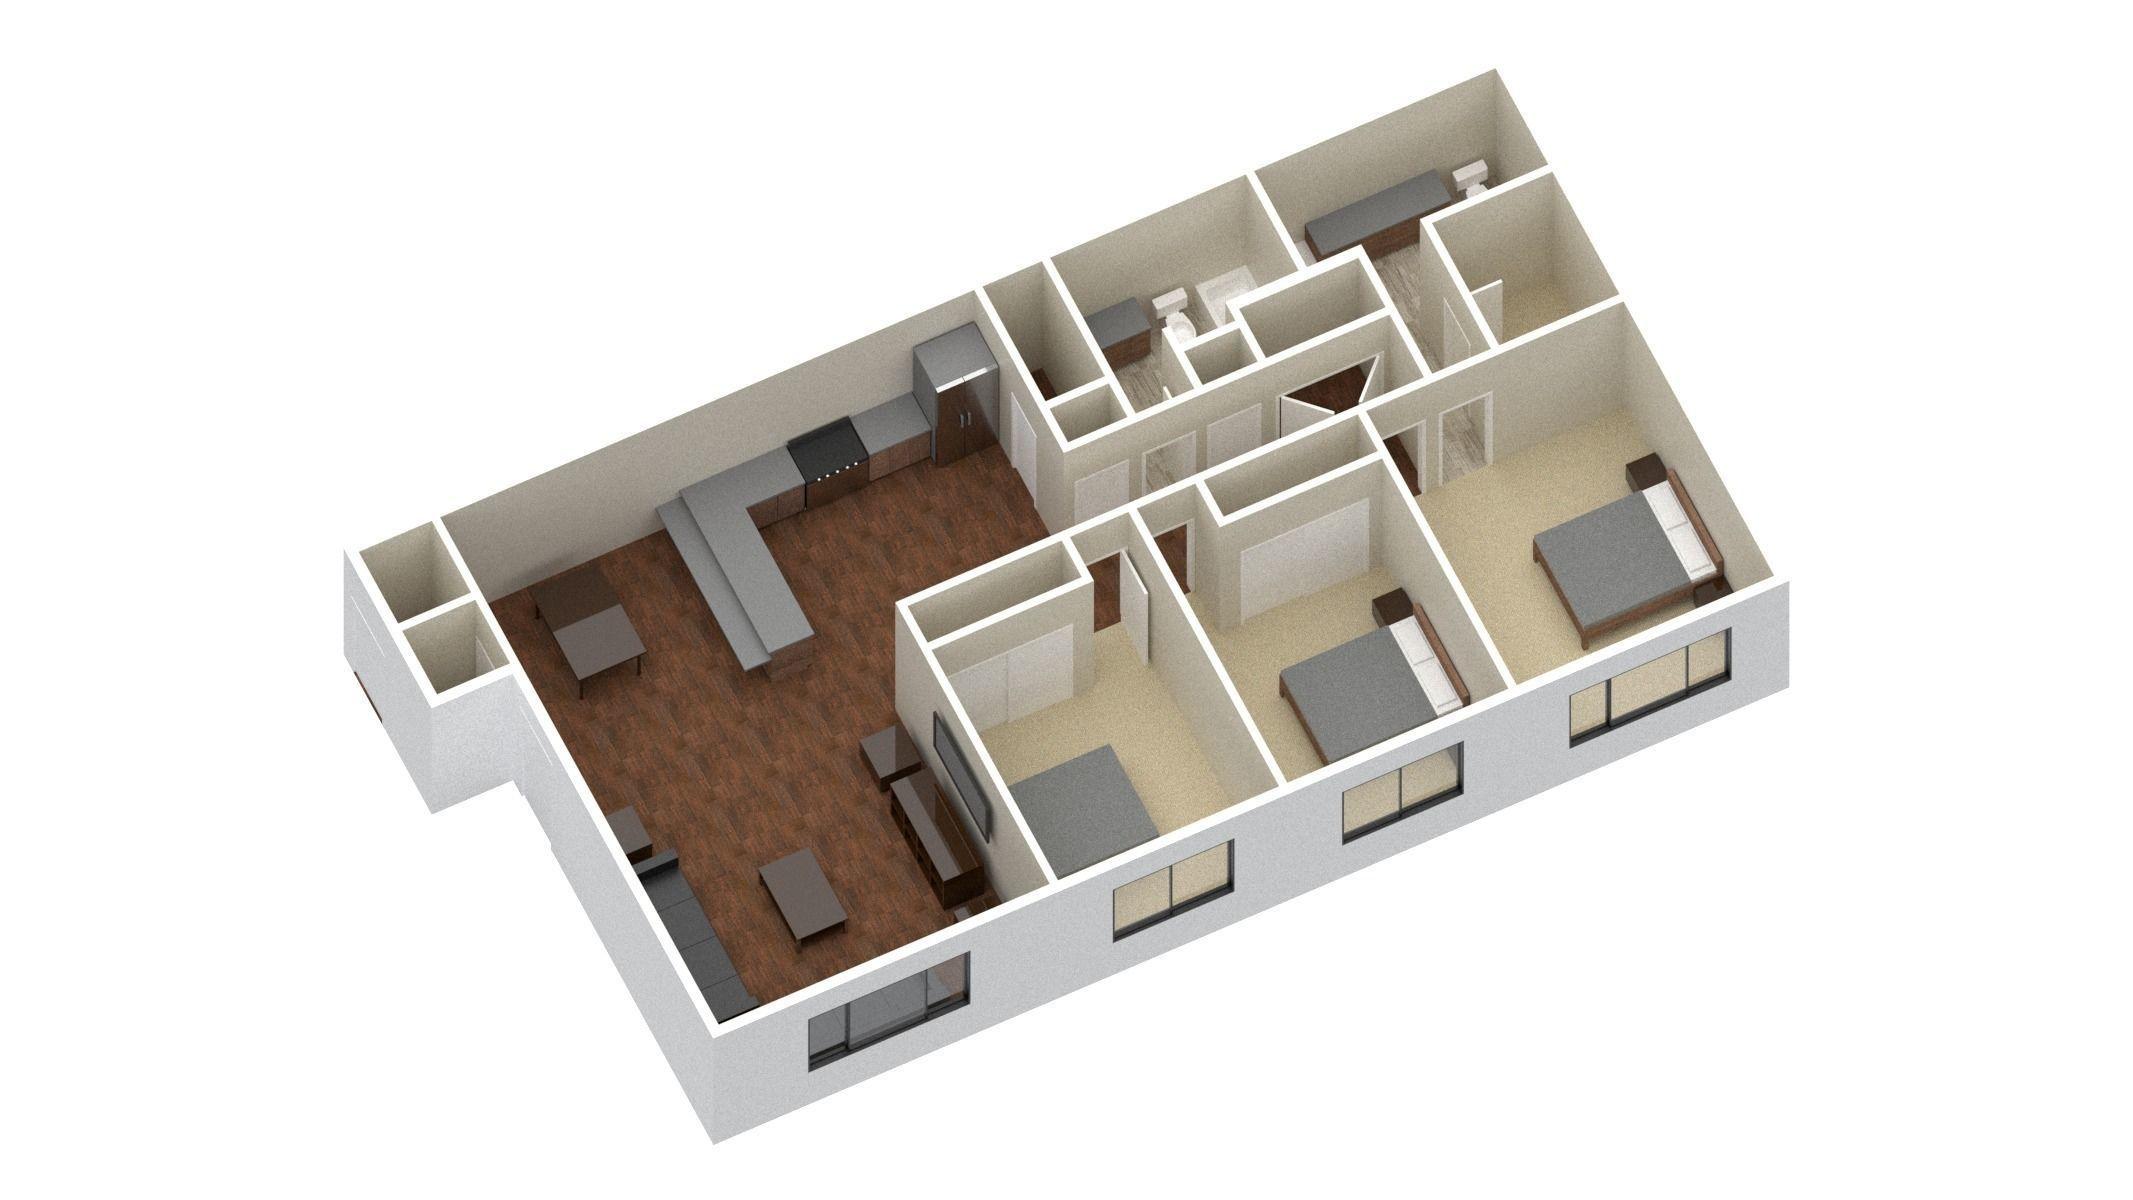 3 Bedroom 2 Bathroom Apartment Unit Model Modern Architectural 3d Model